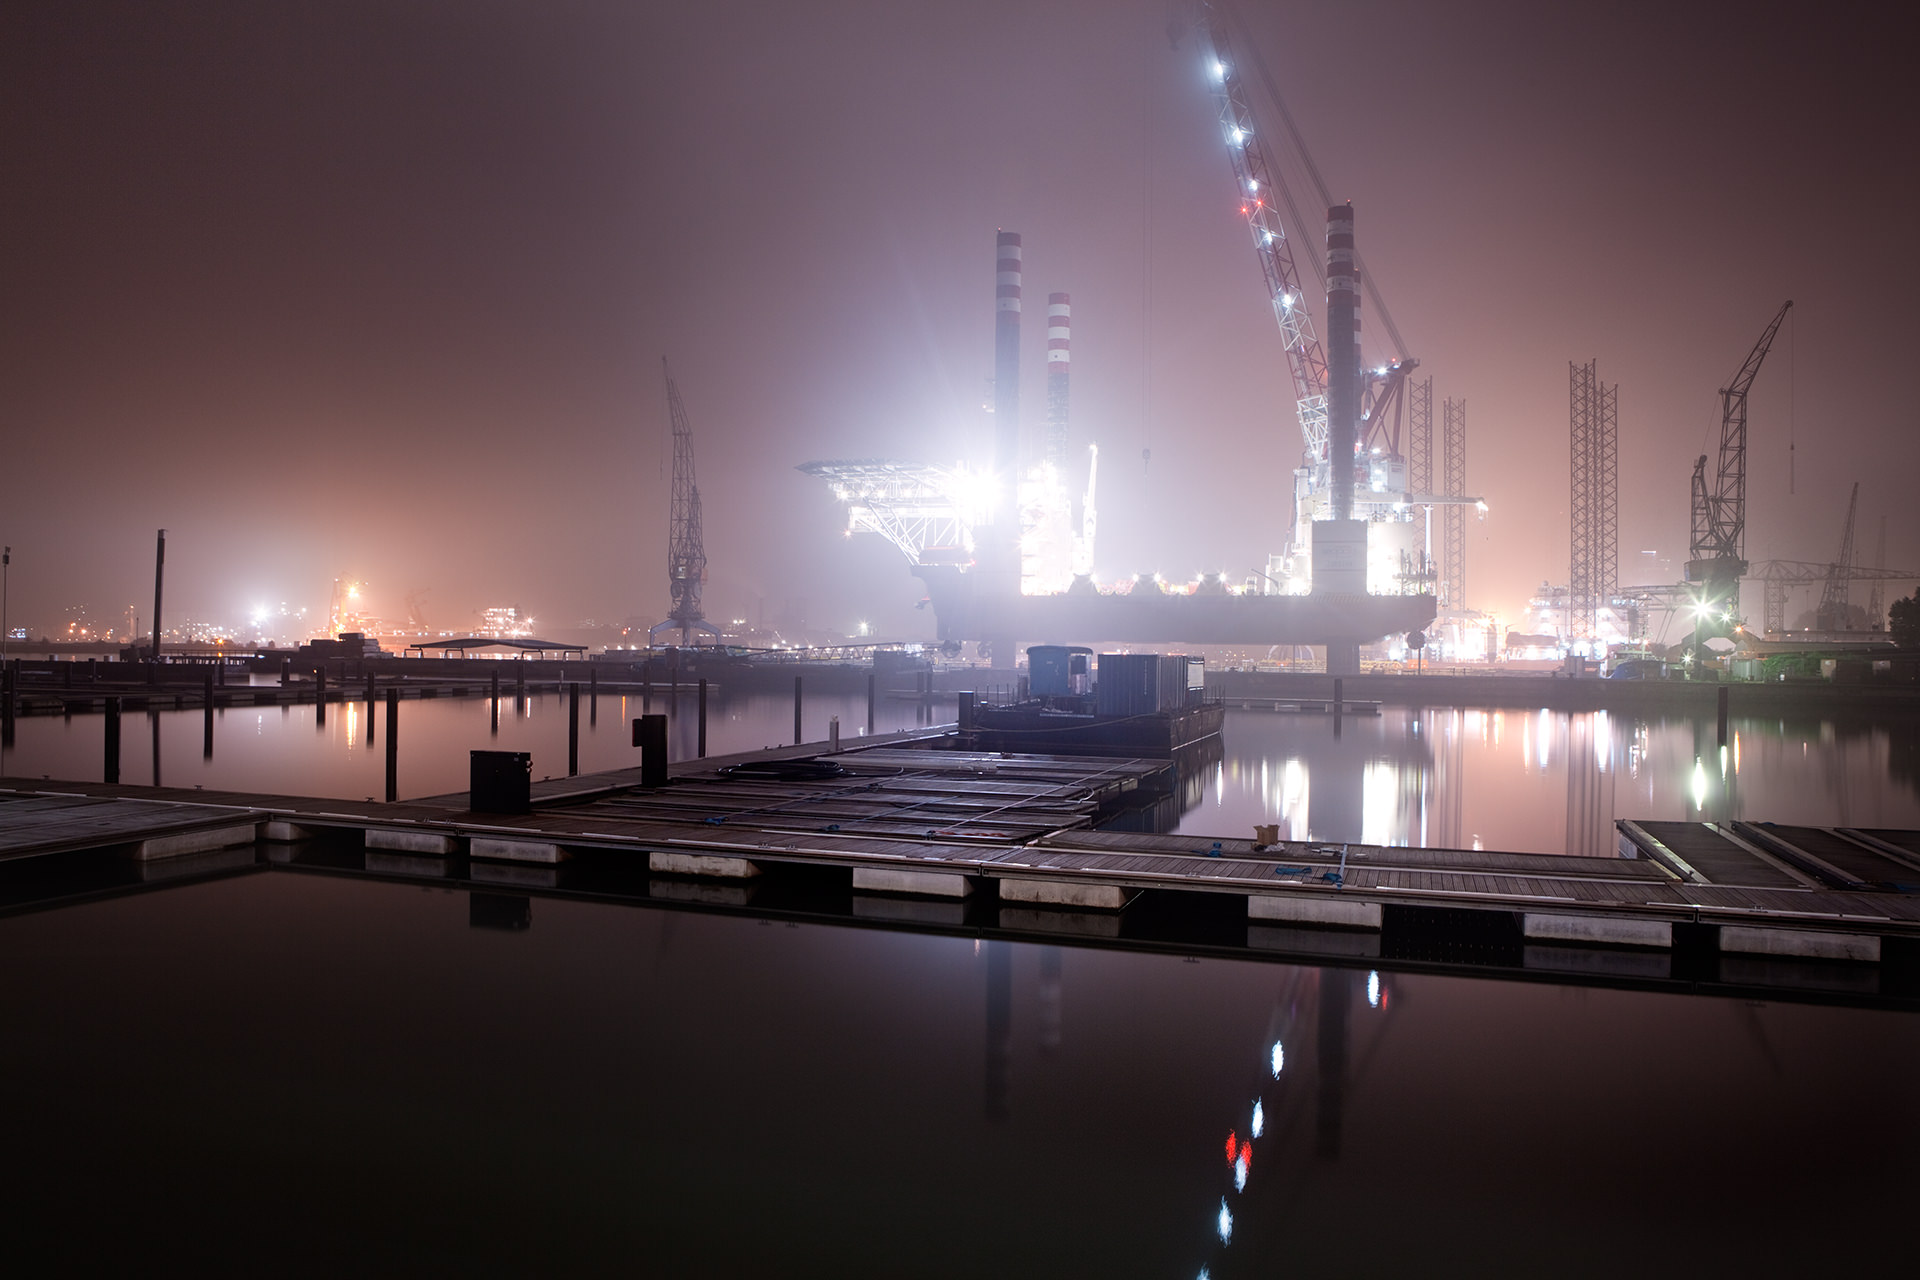 Nacht-landschap-amsterdam-gaven-boot-fotografie-water-kade.jpg